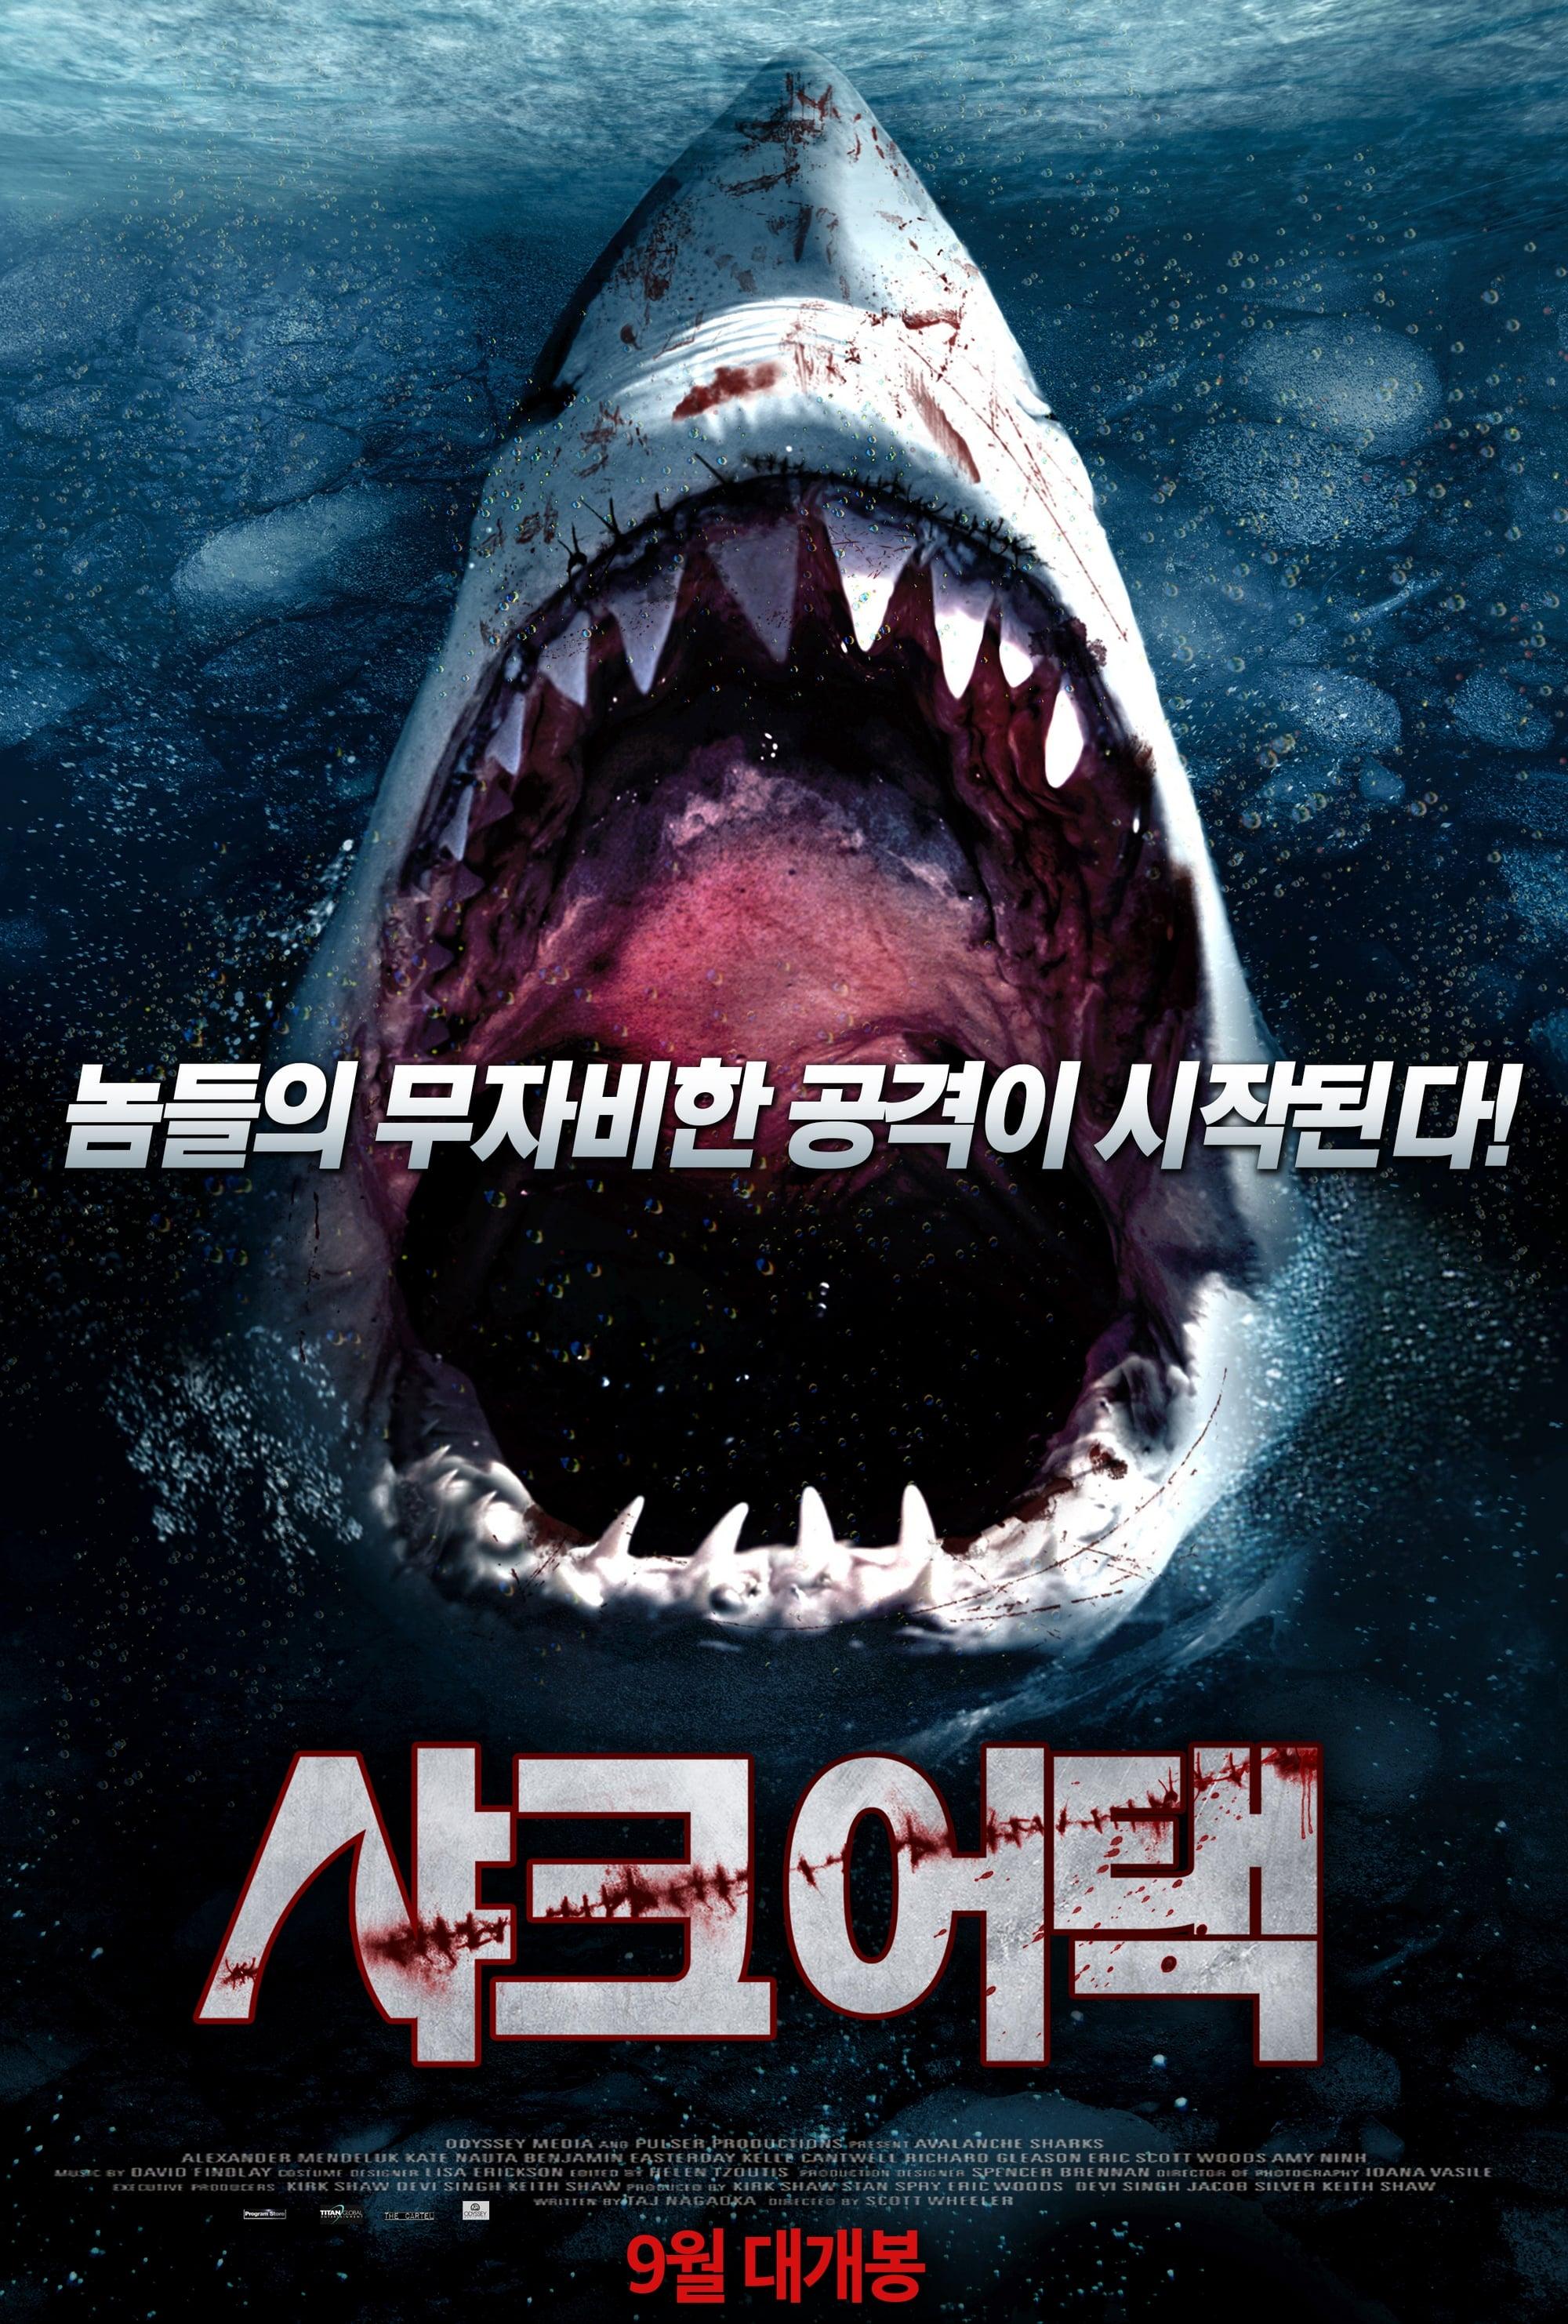 Avalanche Sharks (2014)